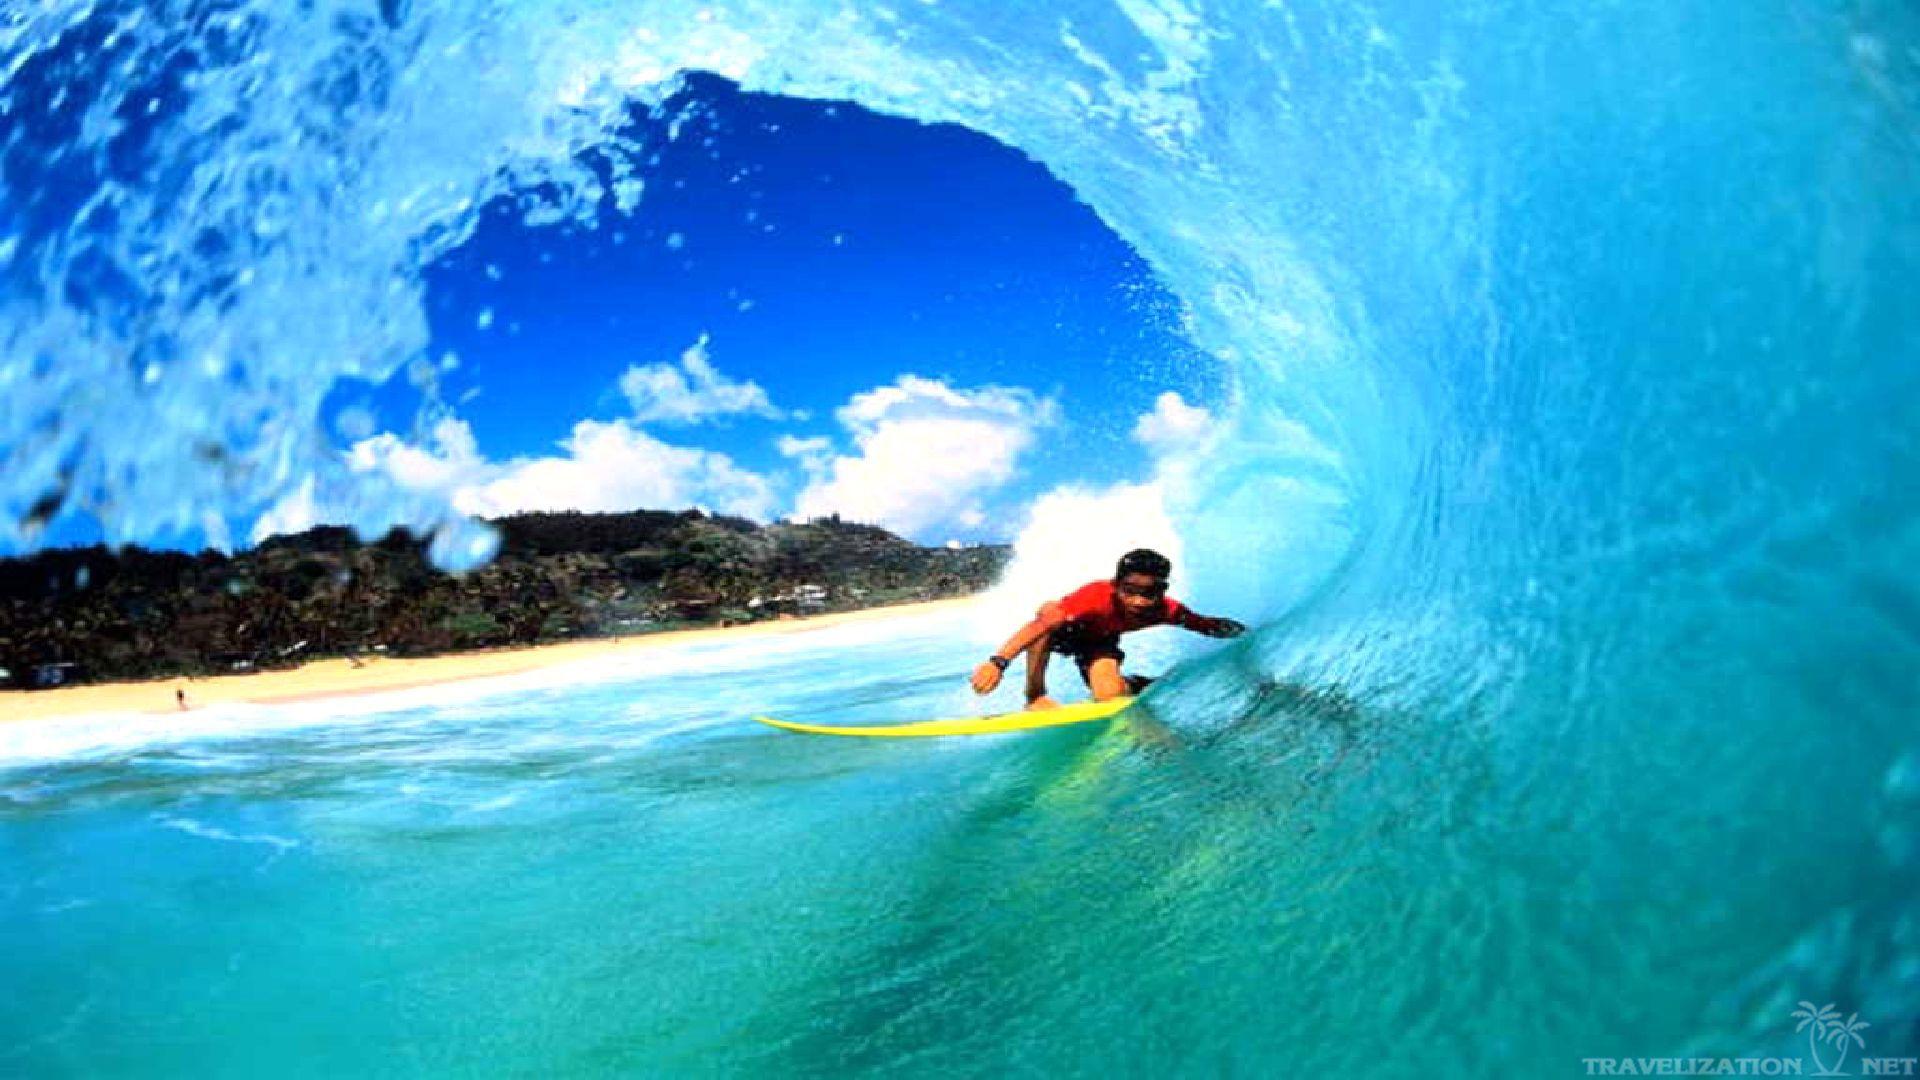 Rip Curl Girl Wallpaper Surfing Wallpaper 1920x1080 44134